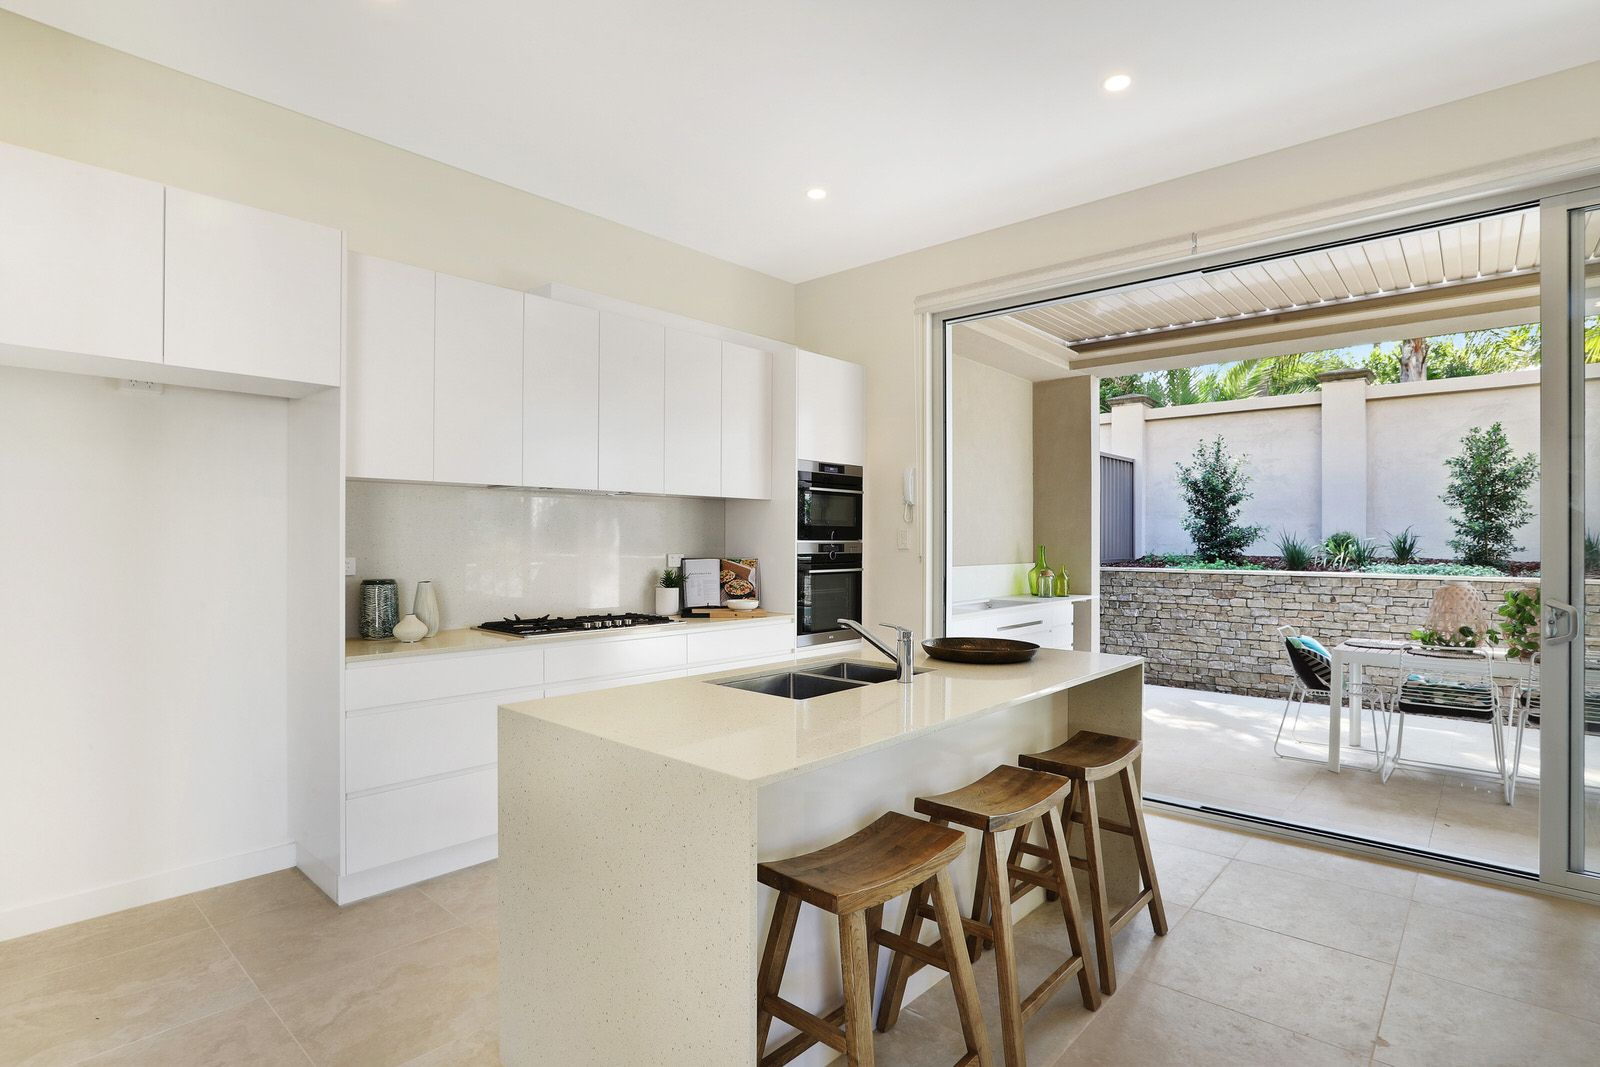 1/27 Epacris Ave, Caringbah South NSW 2229, Image 1